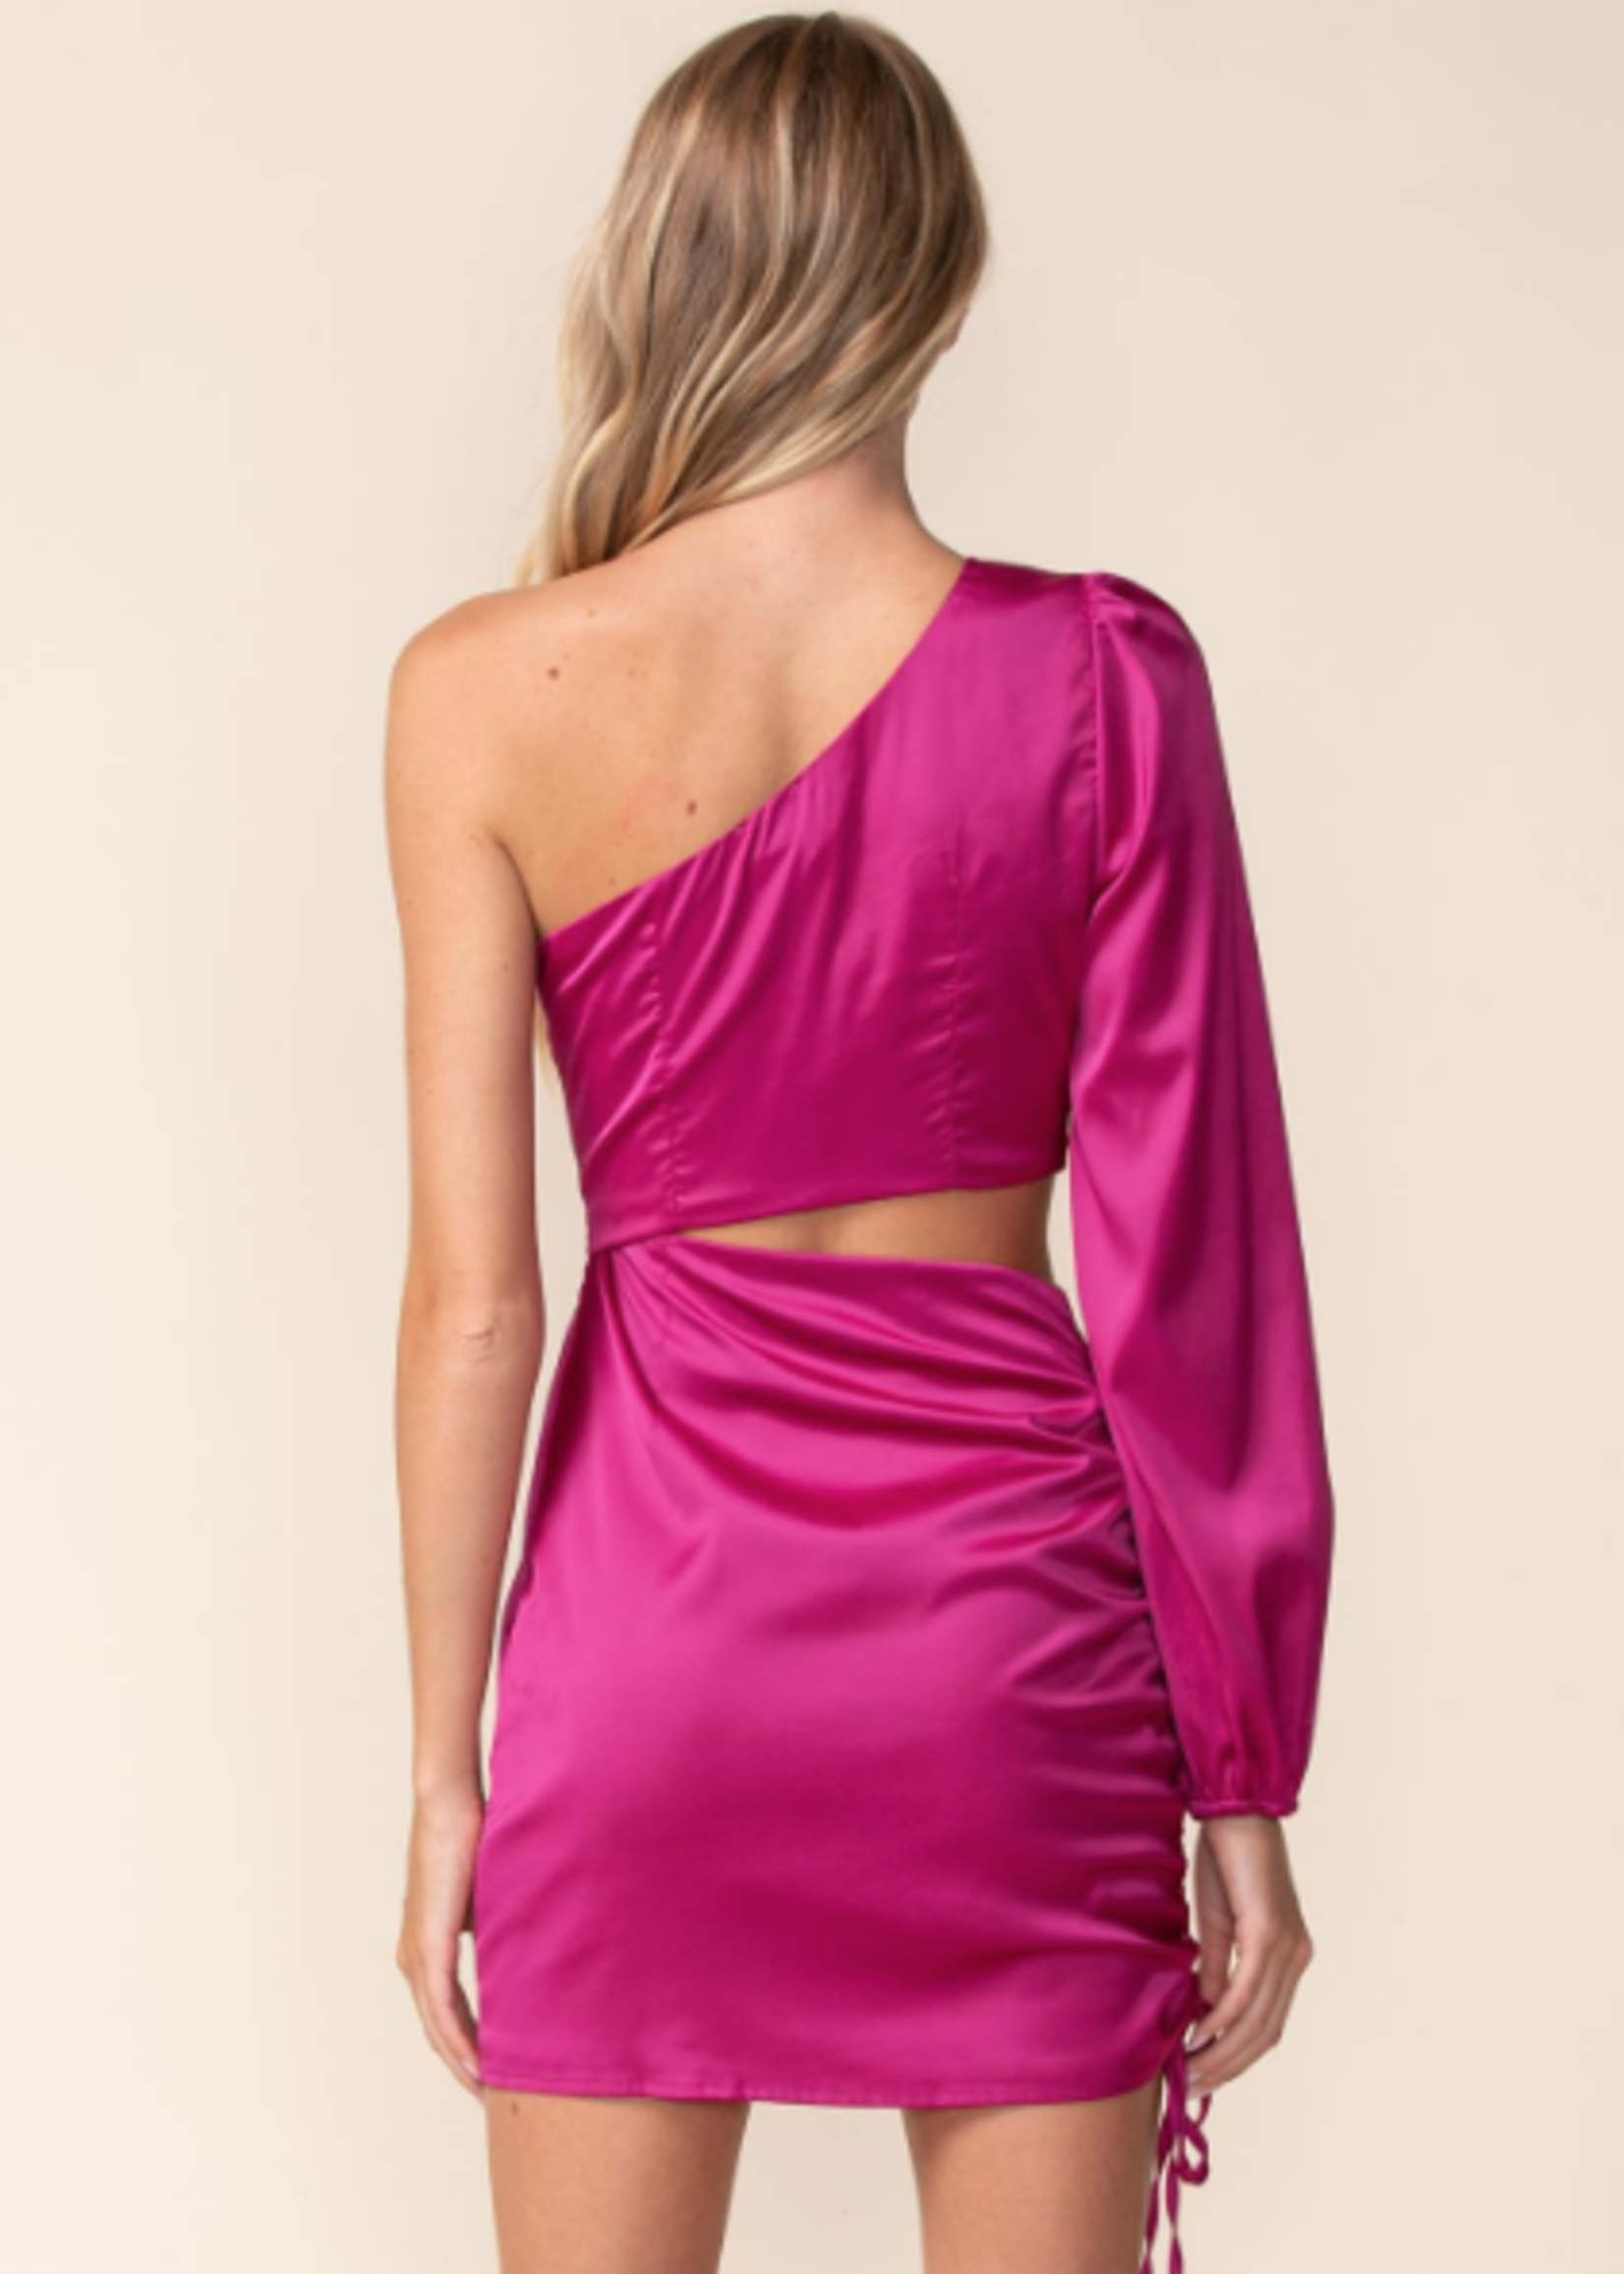 Make It Count Satin Dress (2 Colors)